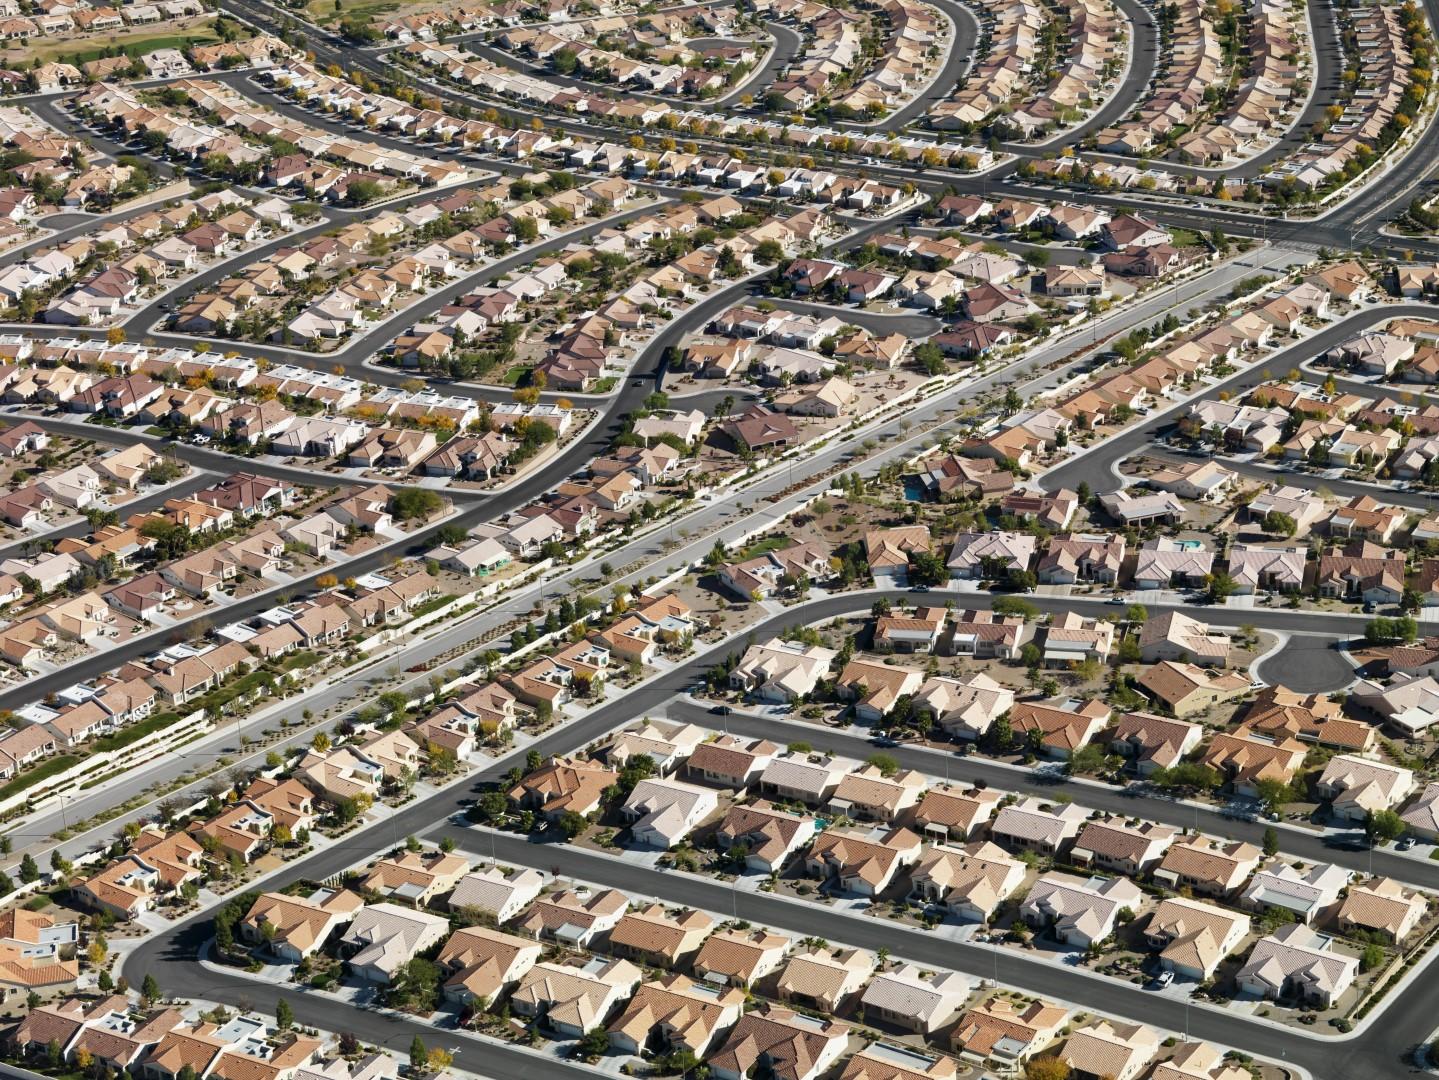 urban-sprawl-Large.jpg